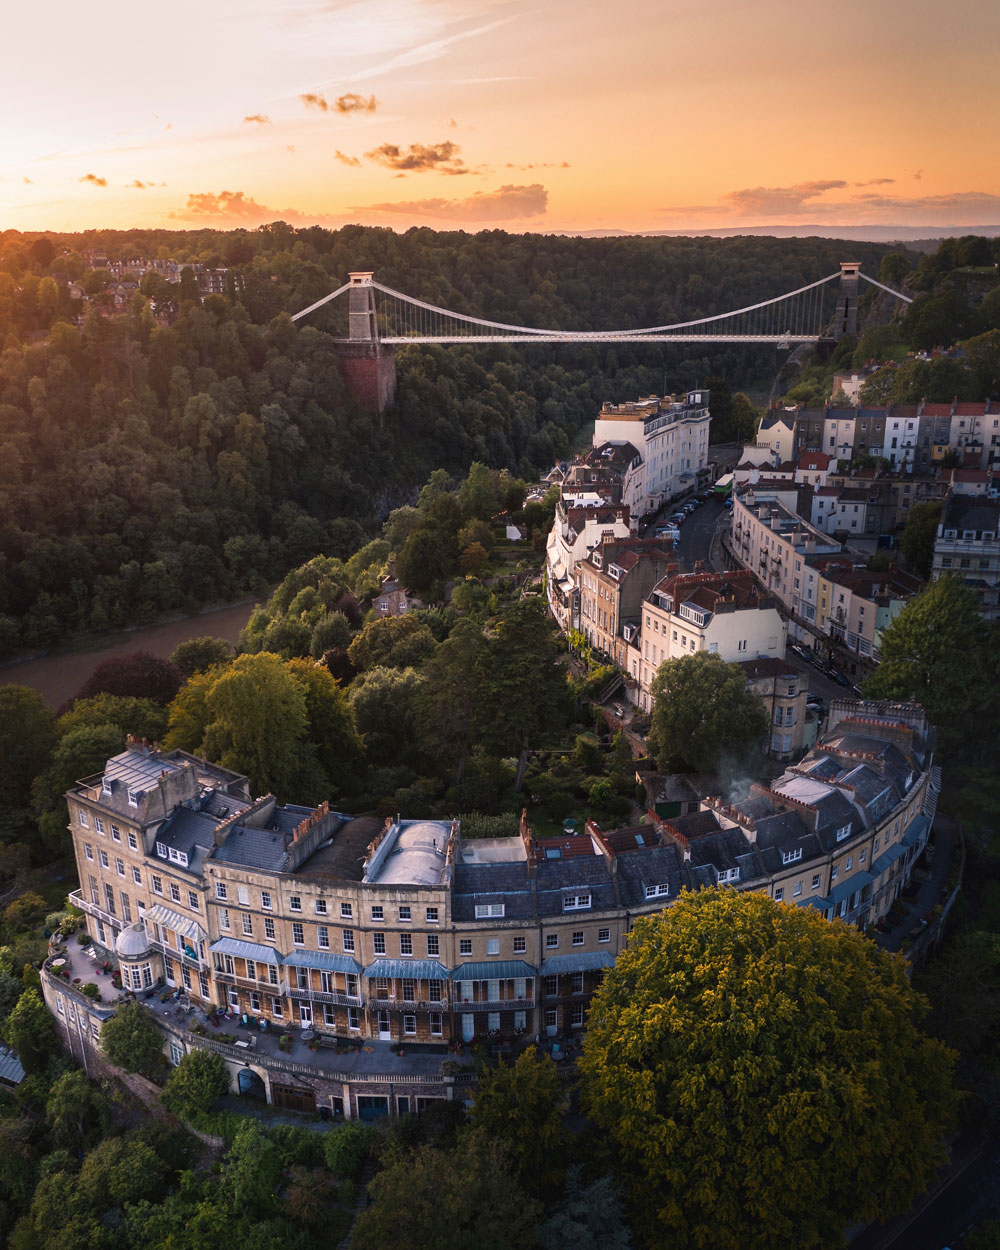 'Sunset over Bristol' by @tom.bridges – Bristol, UK